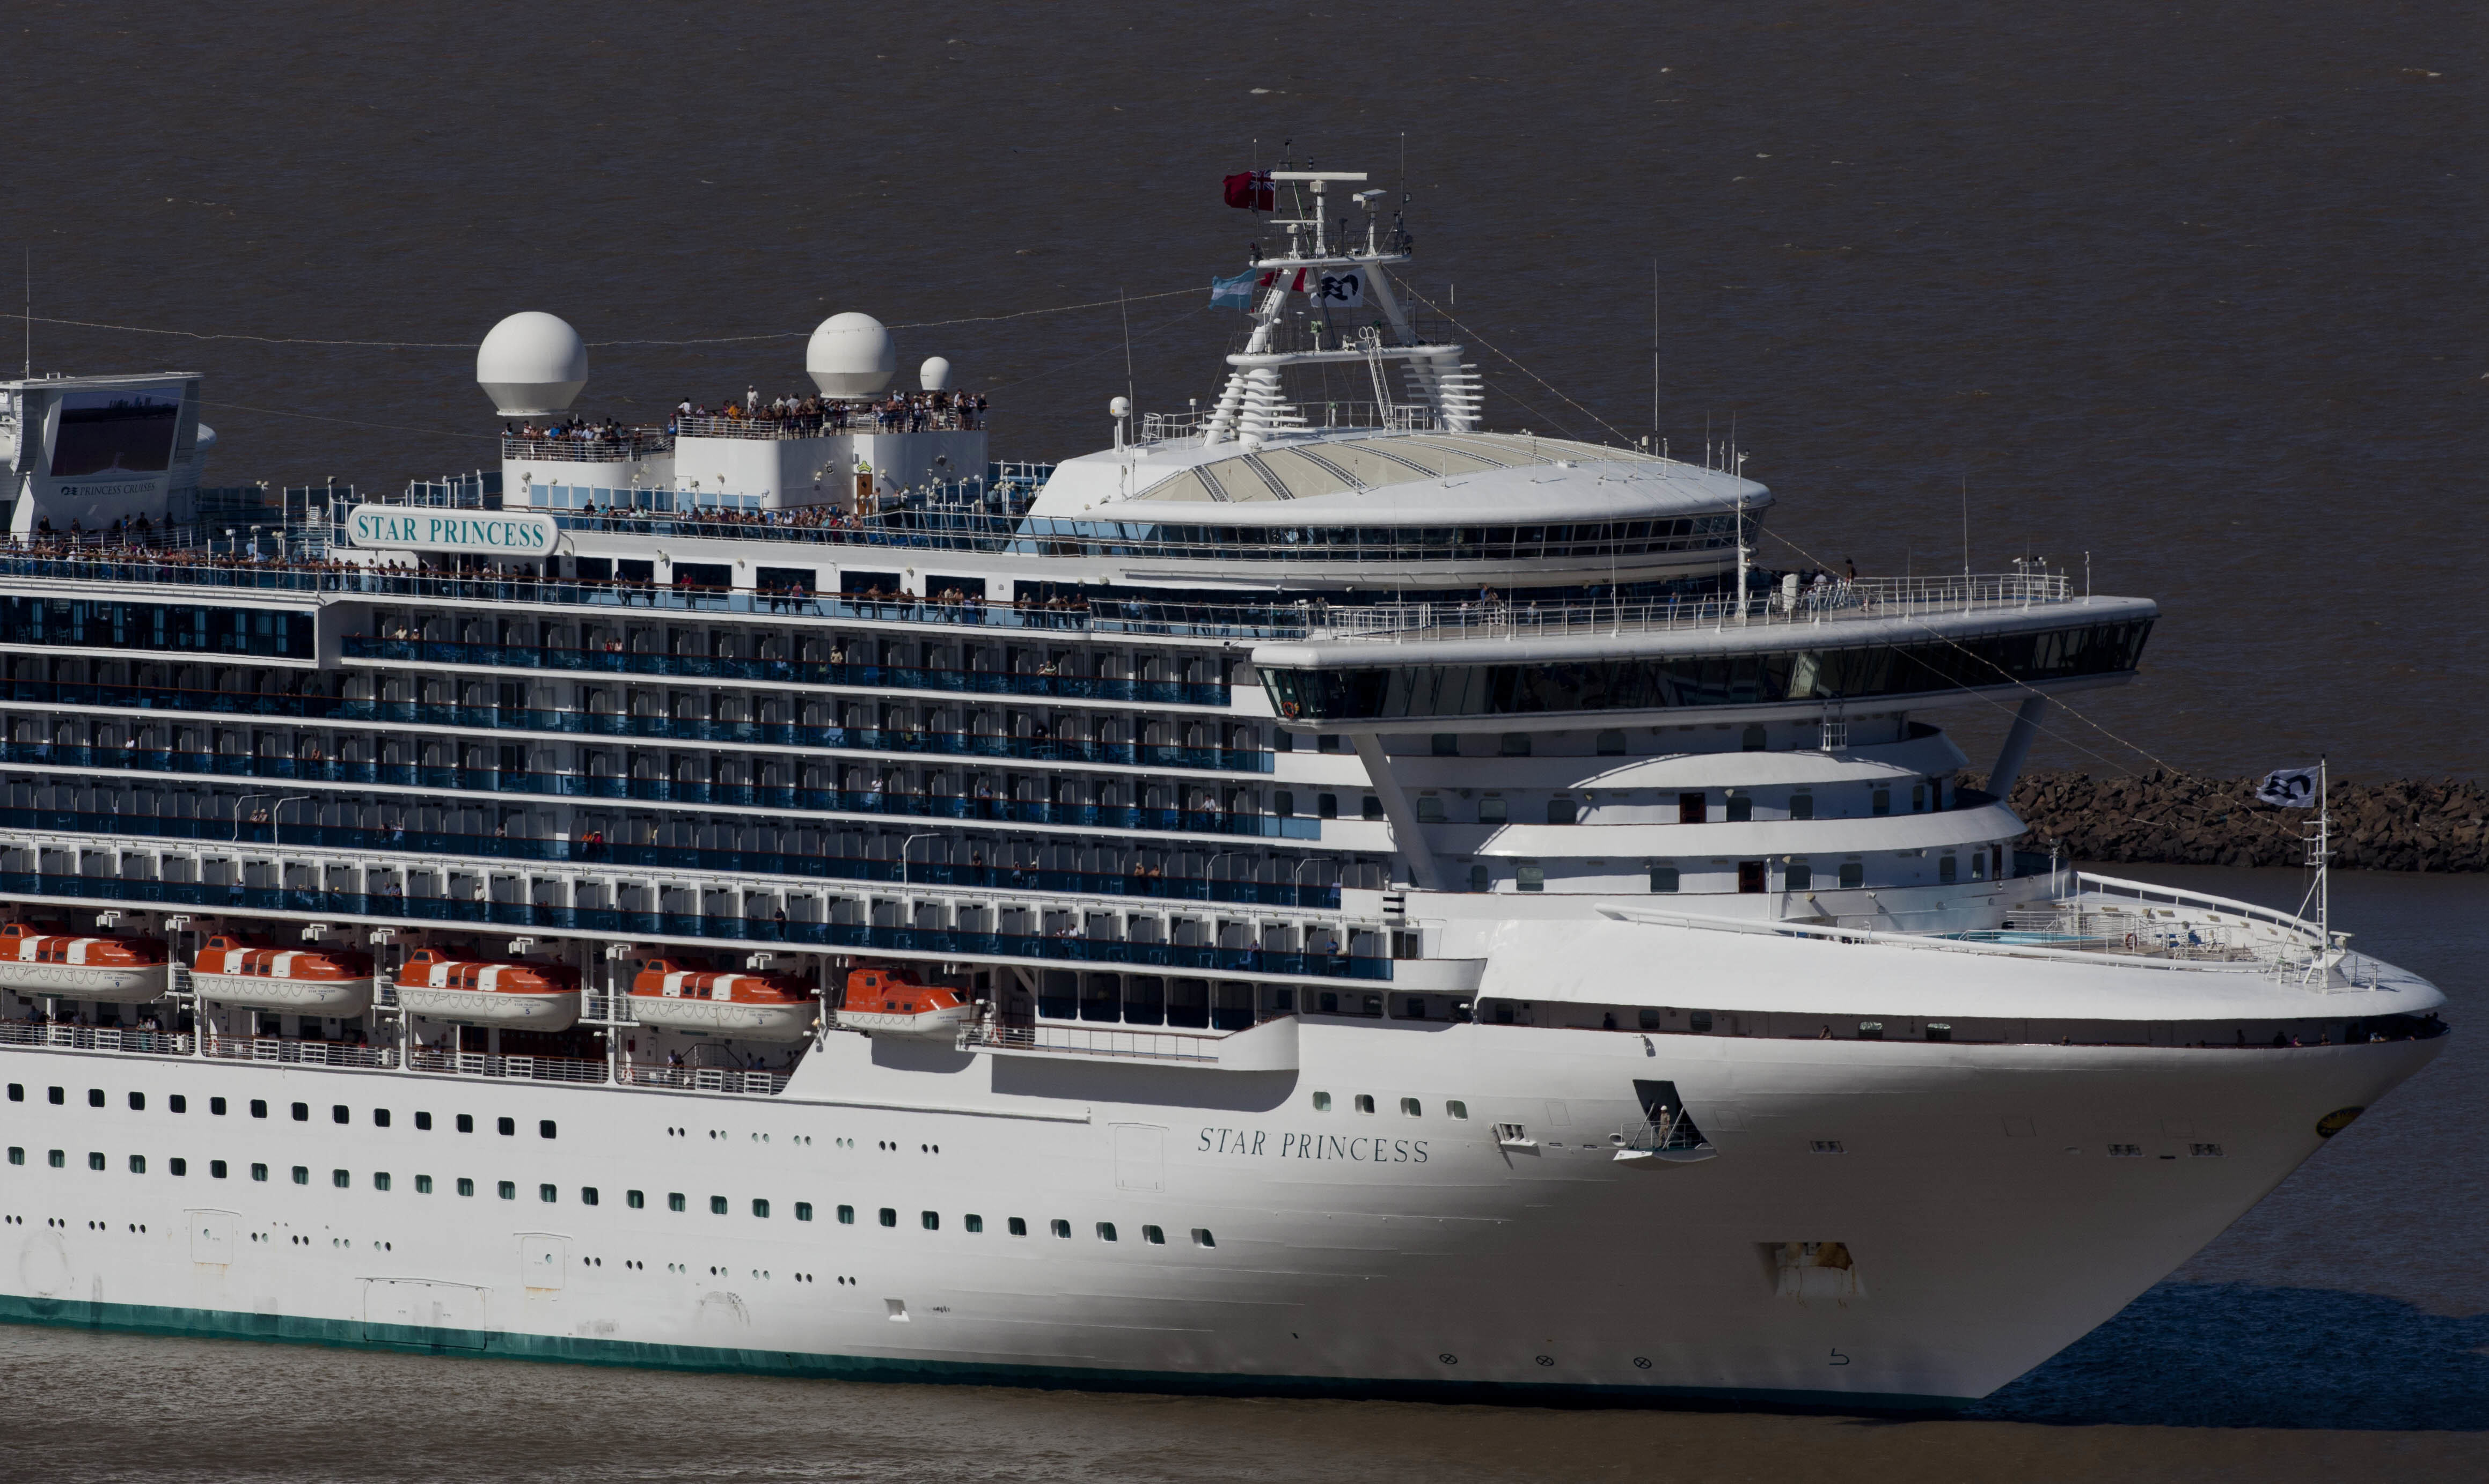 A Princess Cruise Line ship leaves Buenos Aires' port in Argentina in 2012. Natacha Pisarenko/AP